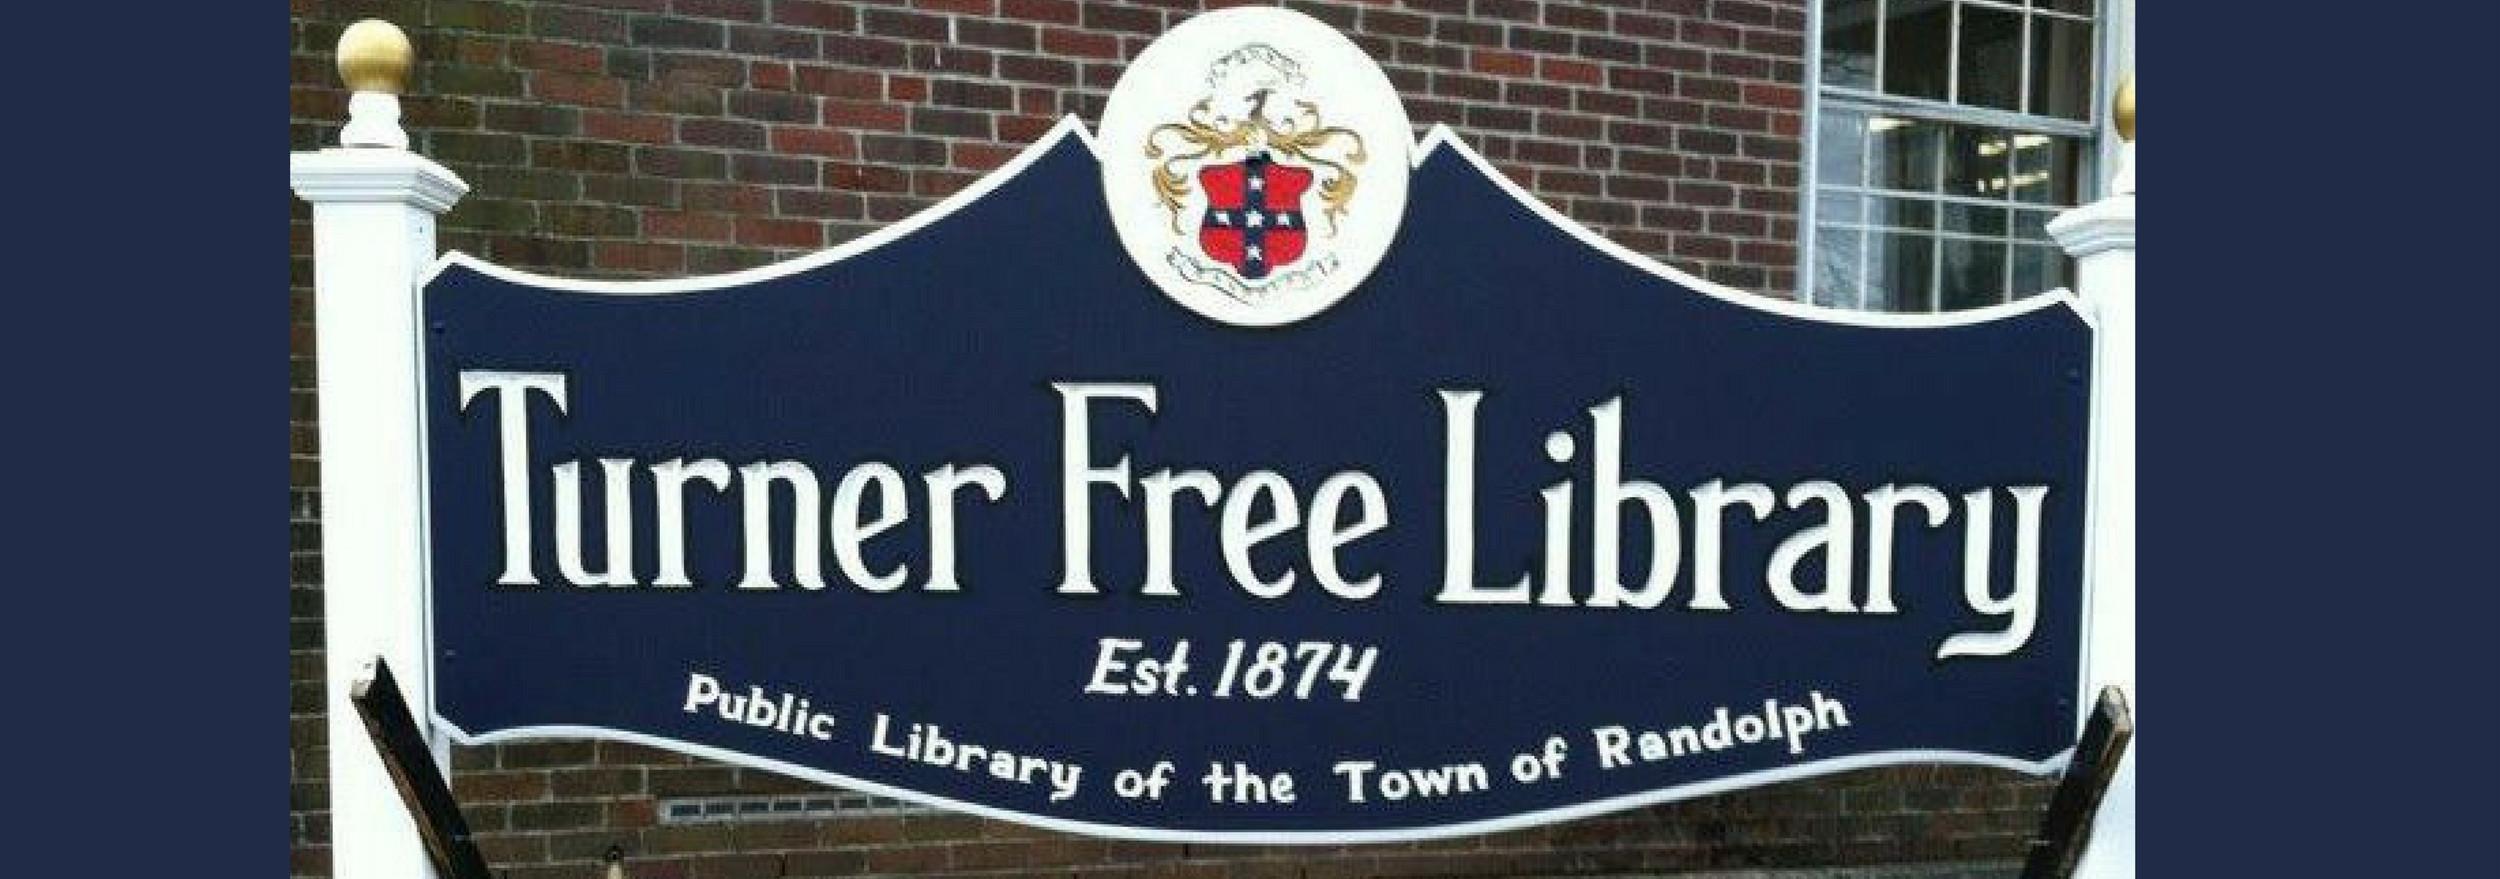 Town of Randolph | Randolph | Turner Free Library